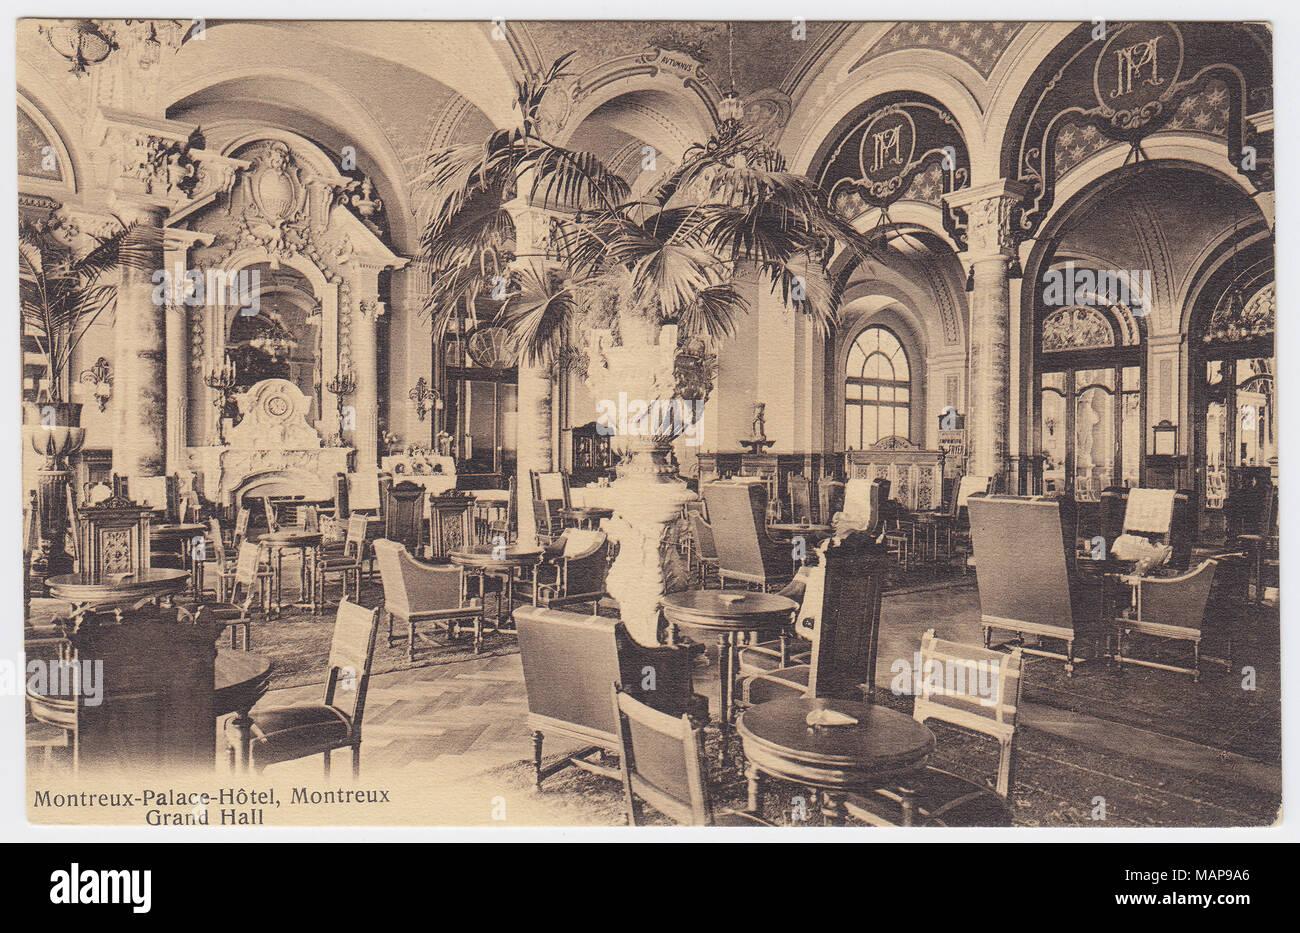 Palace Hotel, Montreux, Switzerland, Grand Hall - Stock Image